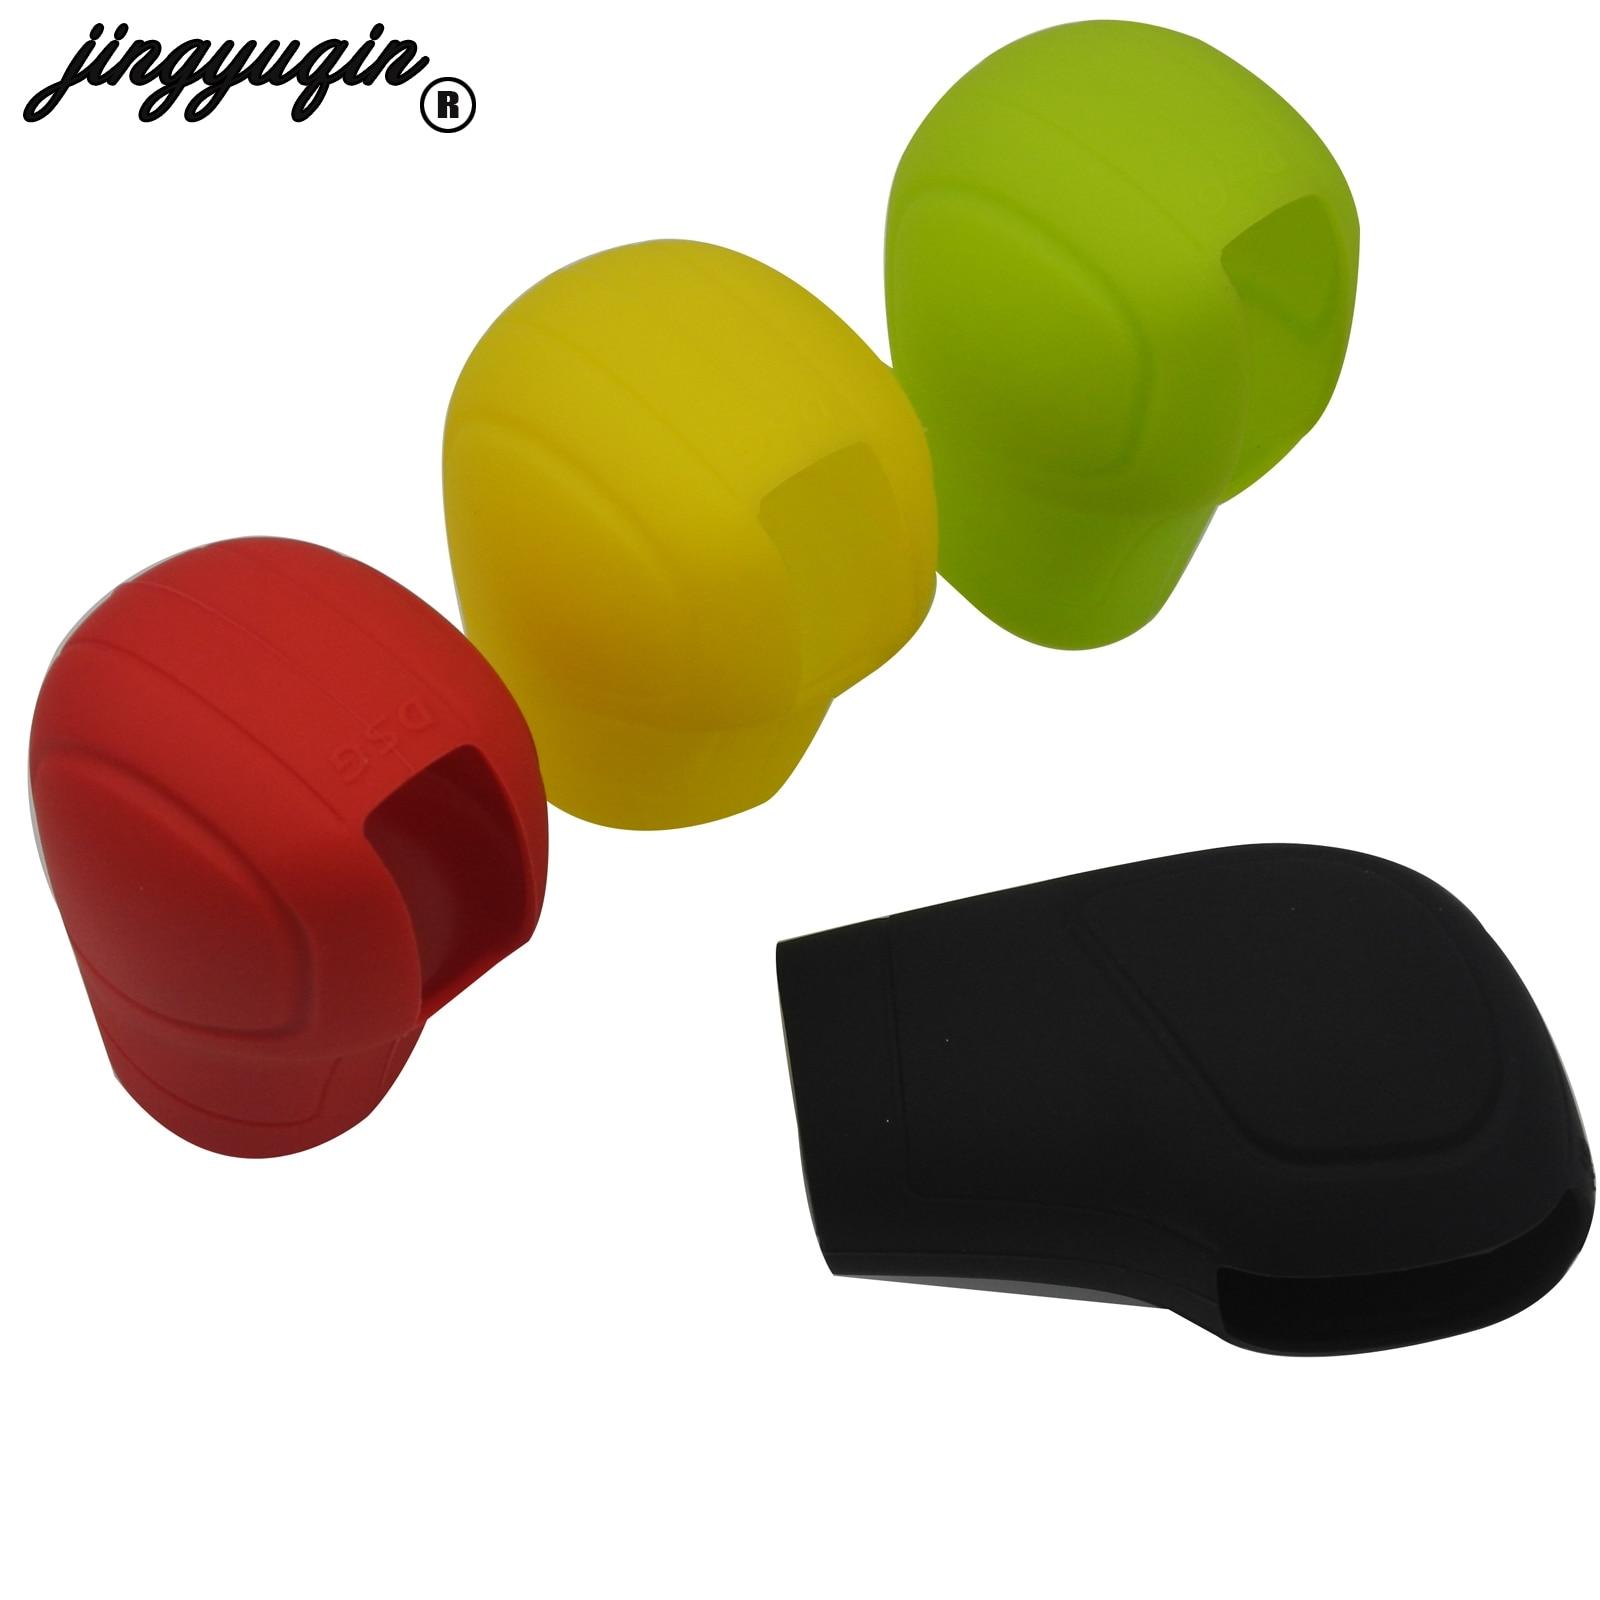 Jingyuqin Colorful Popular Universal Manual Protection Car Silicone Gear Shift Collars Cover Handbrake Grips For Car